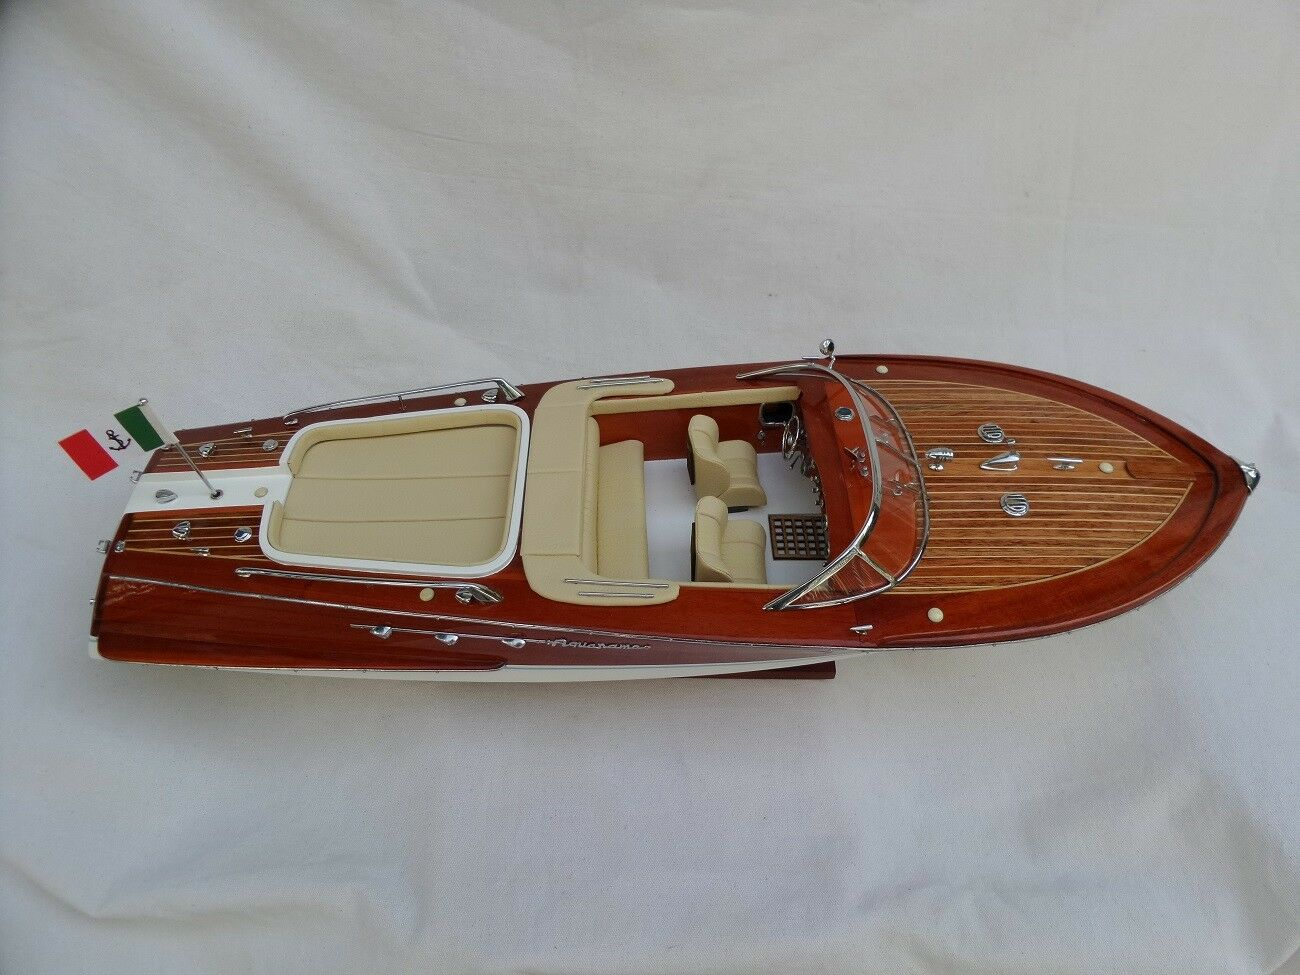 Cedar Wood Riva Aquarama Lamborghini Special 24  Cream Quality Model Boat L60